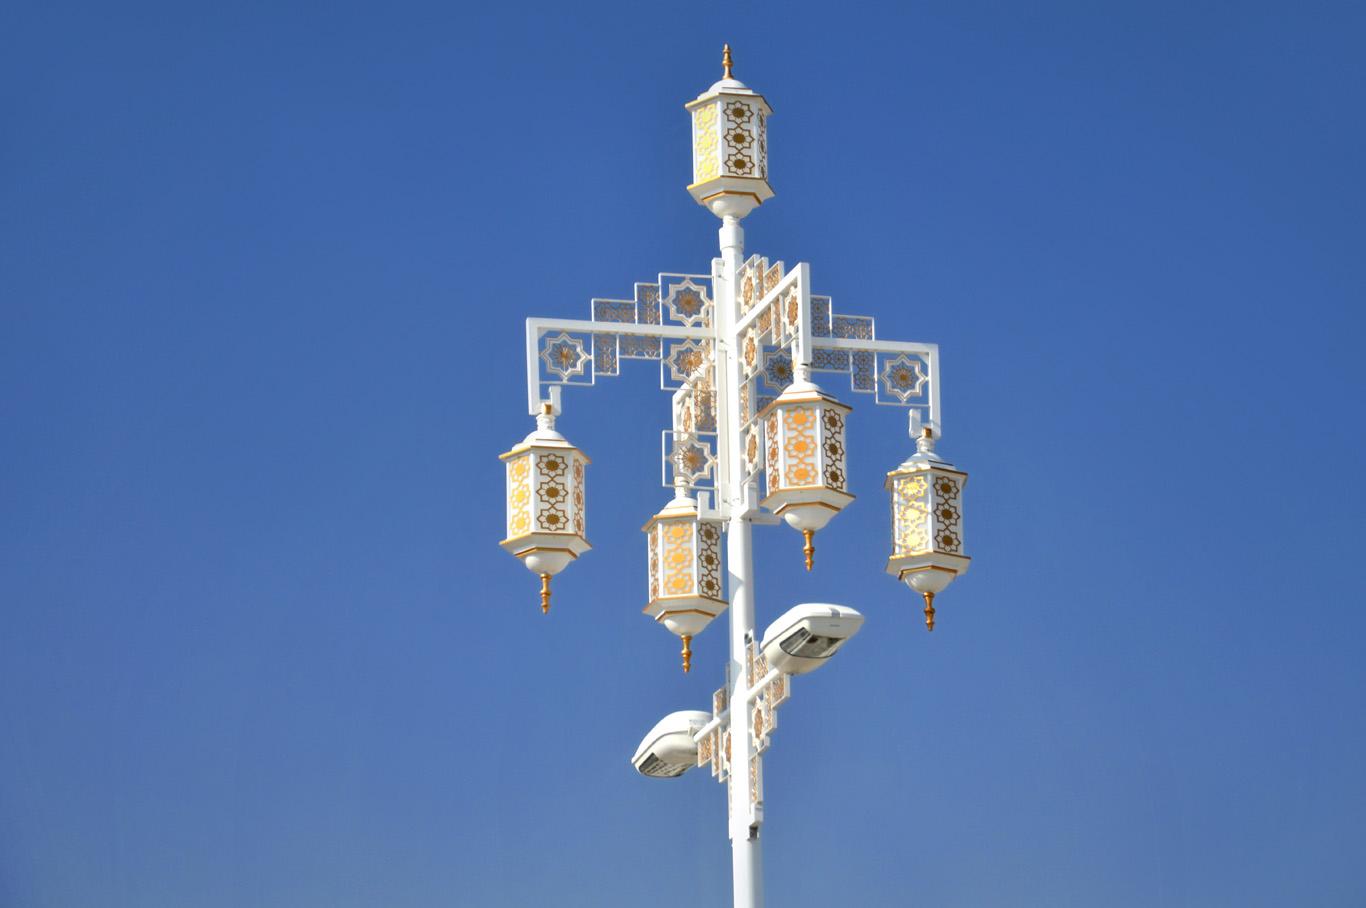 Piece of Art street lamp